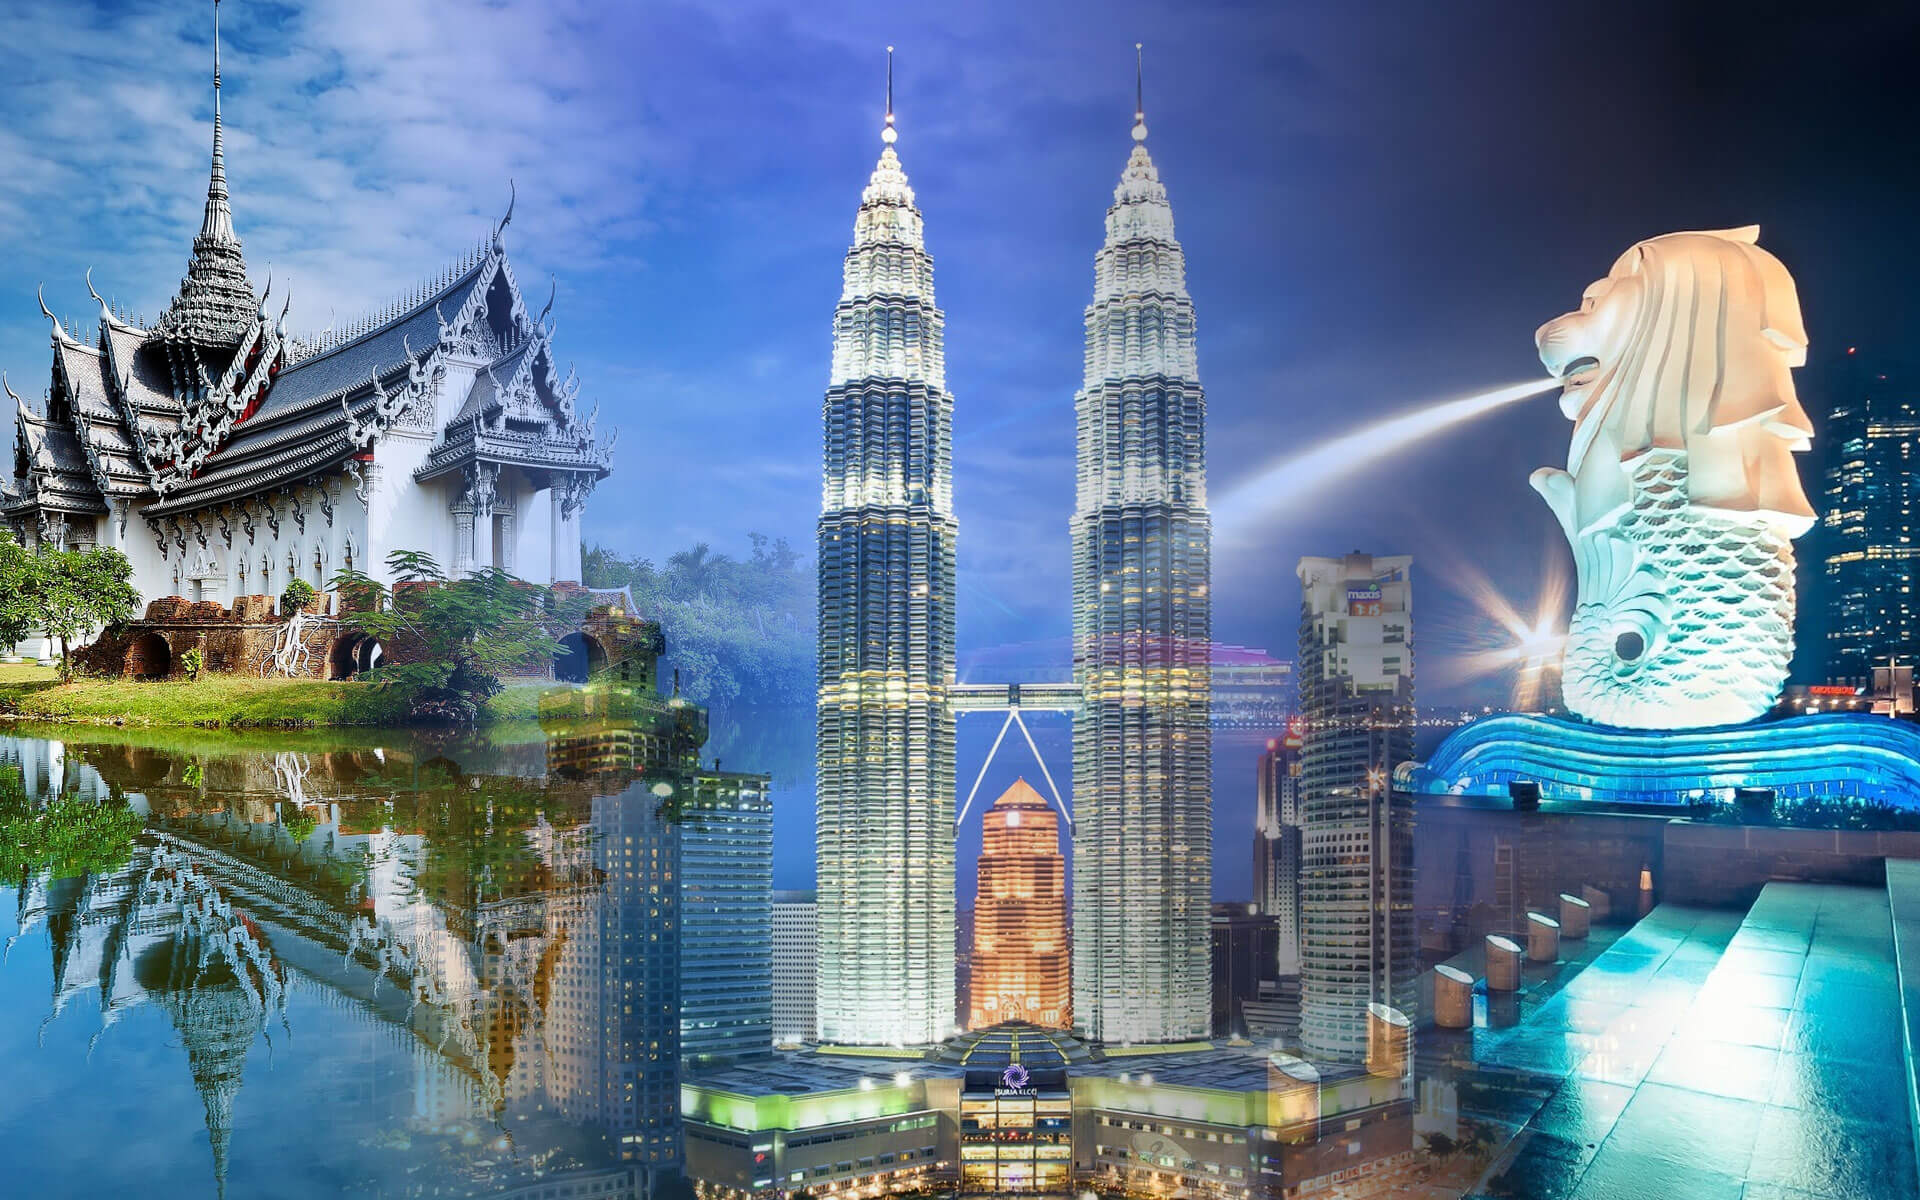 Thailand/Malaysia/Singapore